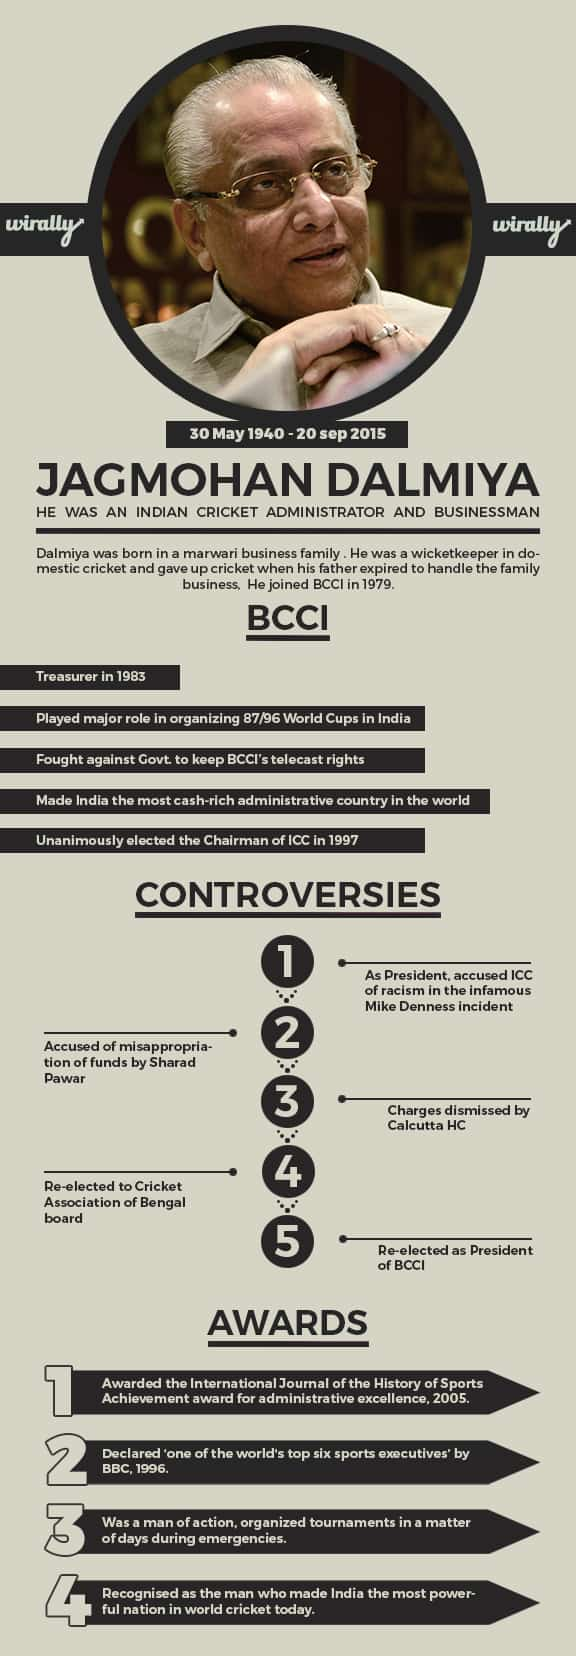 Jagmohan Dalmiya infographic (1)